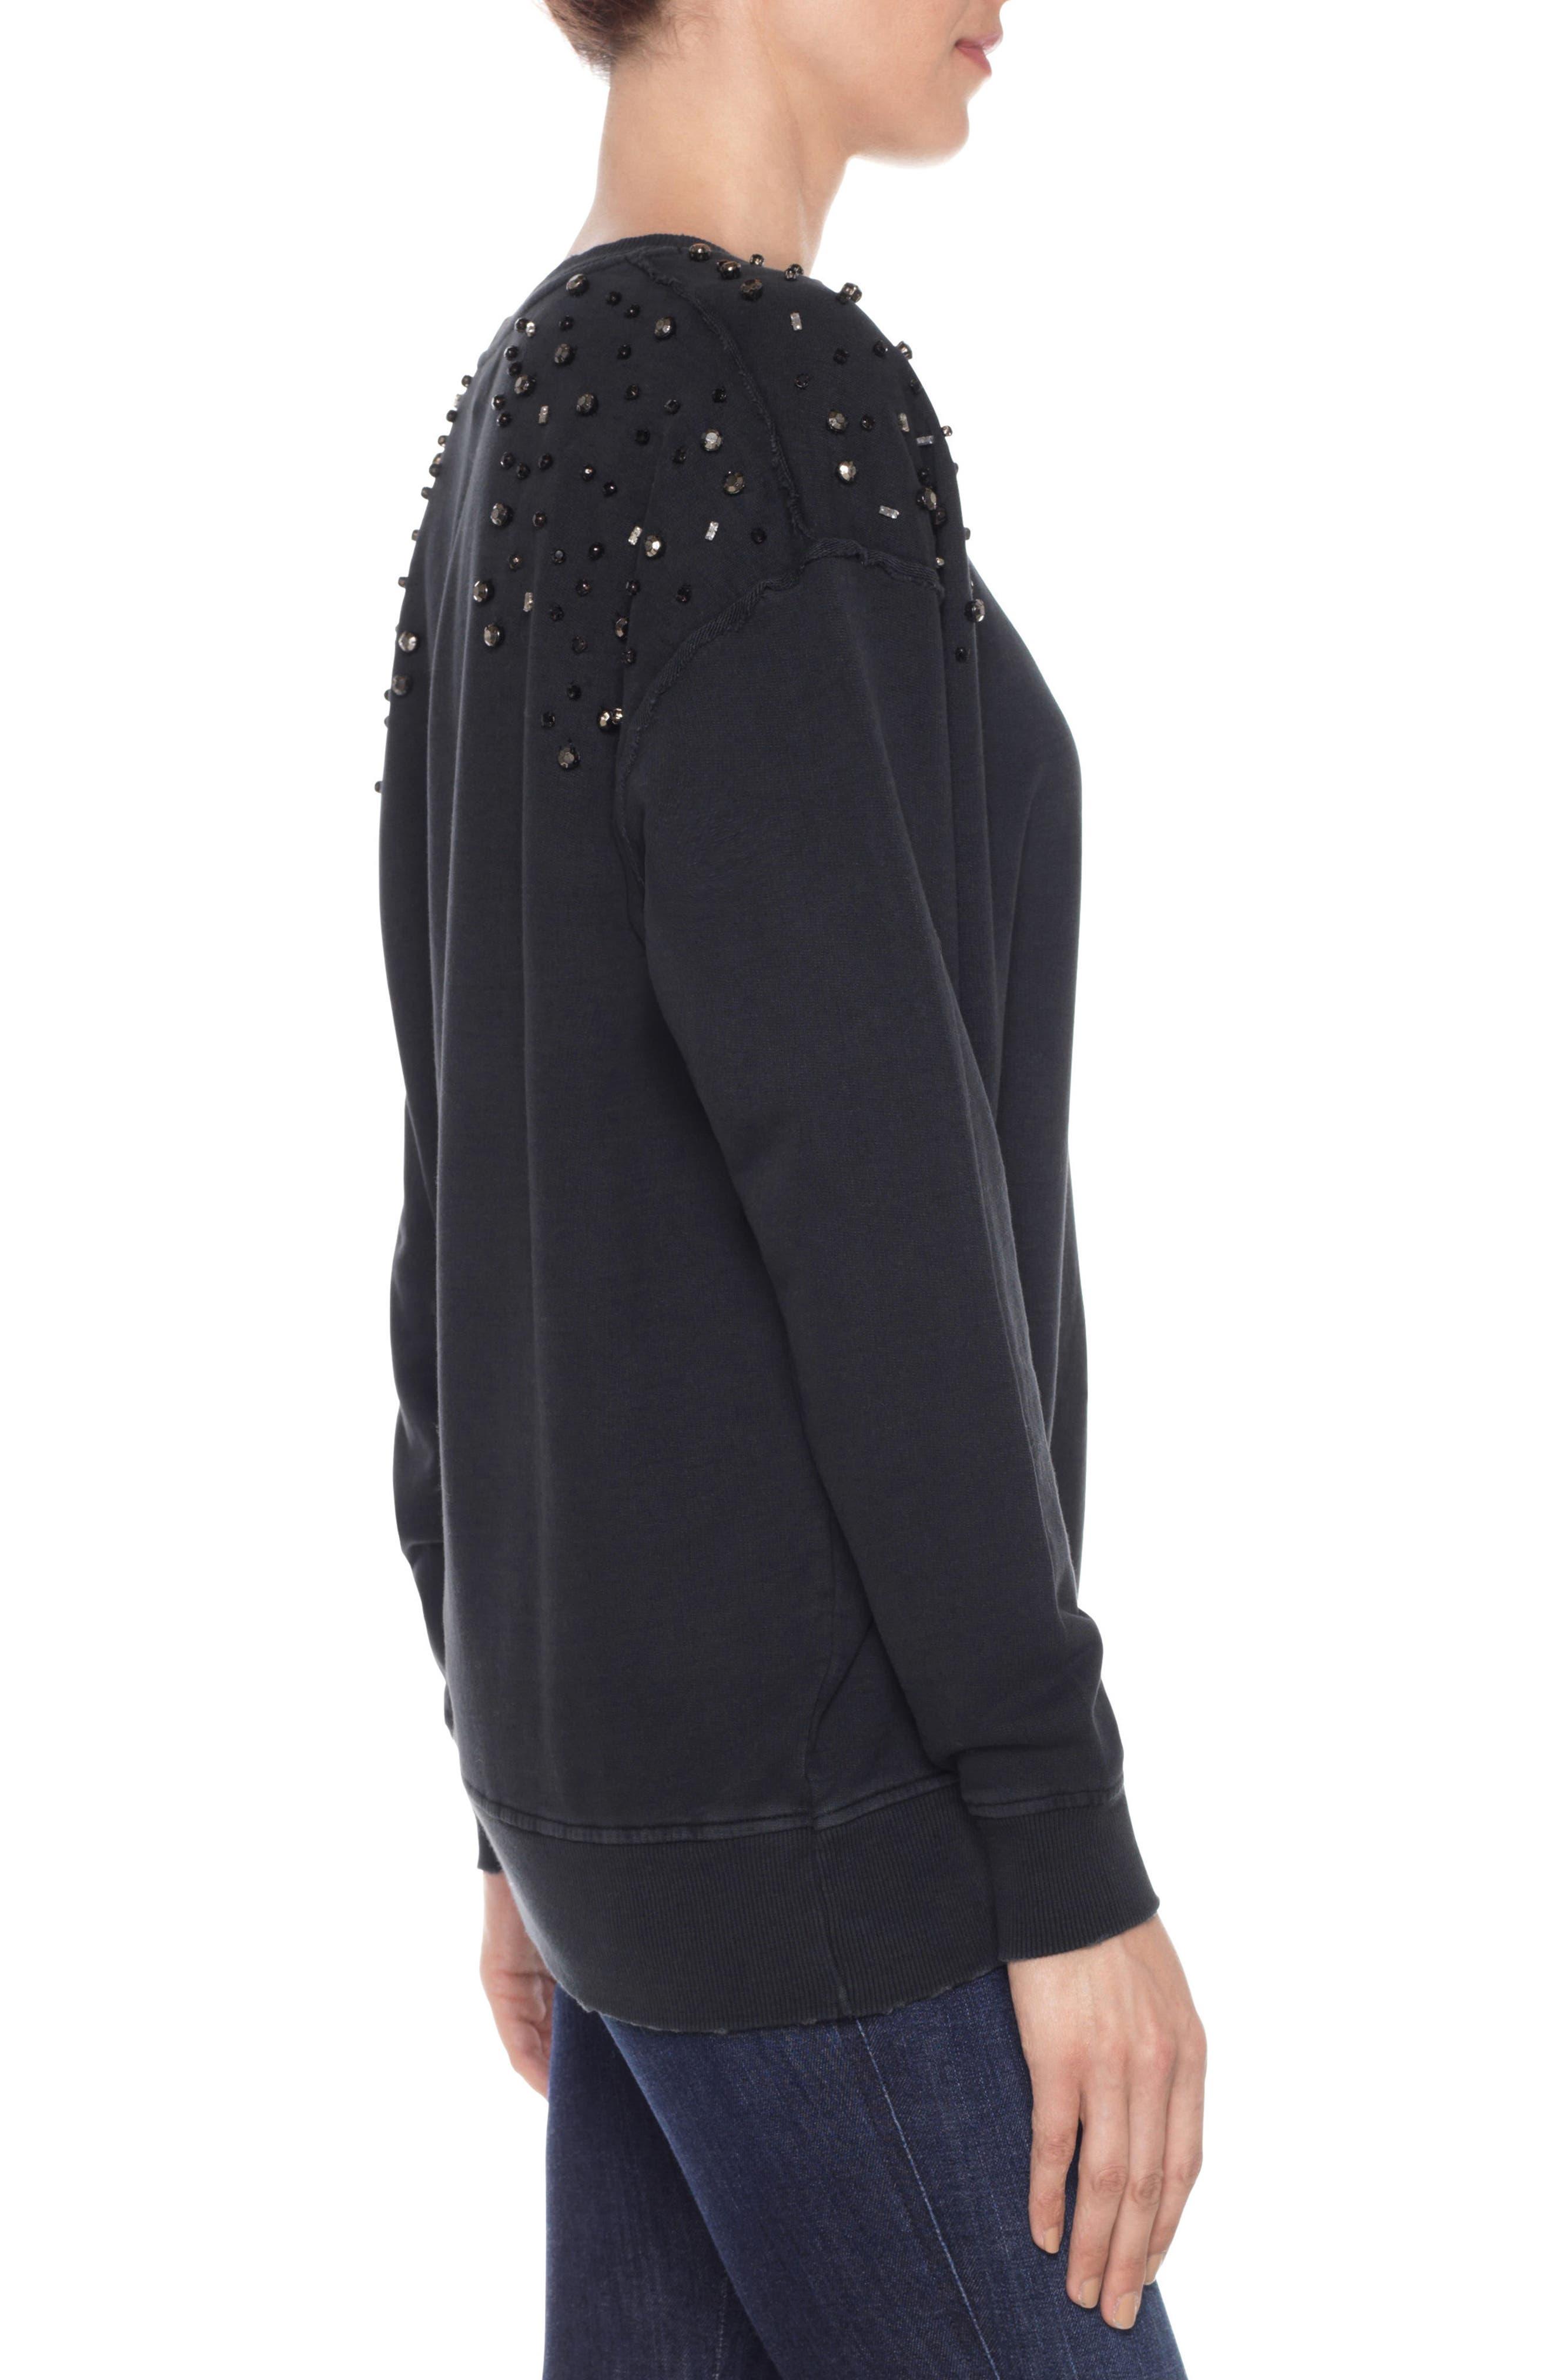 Crystal Sweatshirt,                             Alternate thumbnail 3, color,                             Black